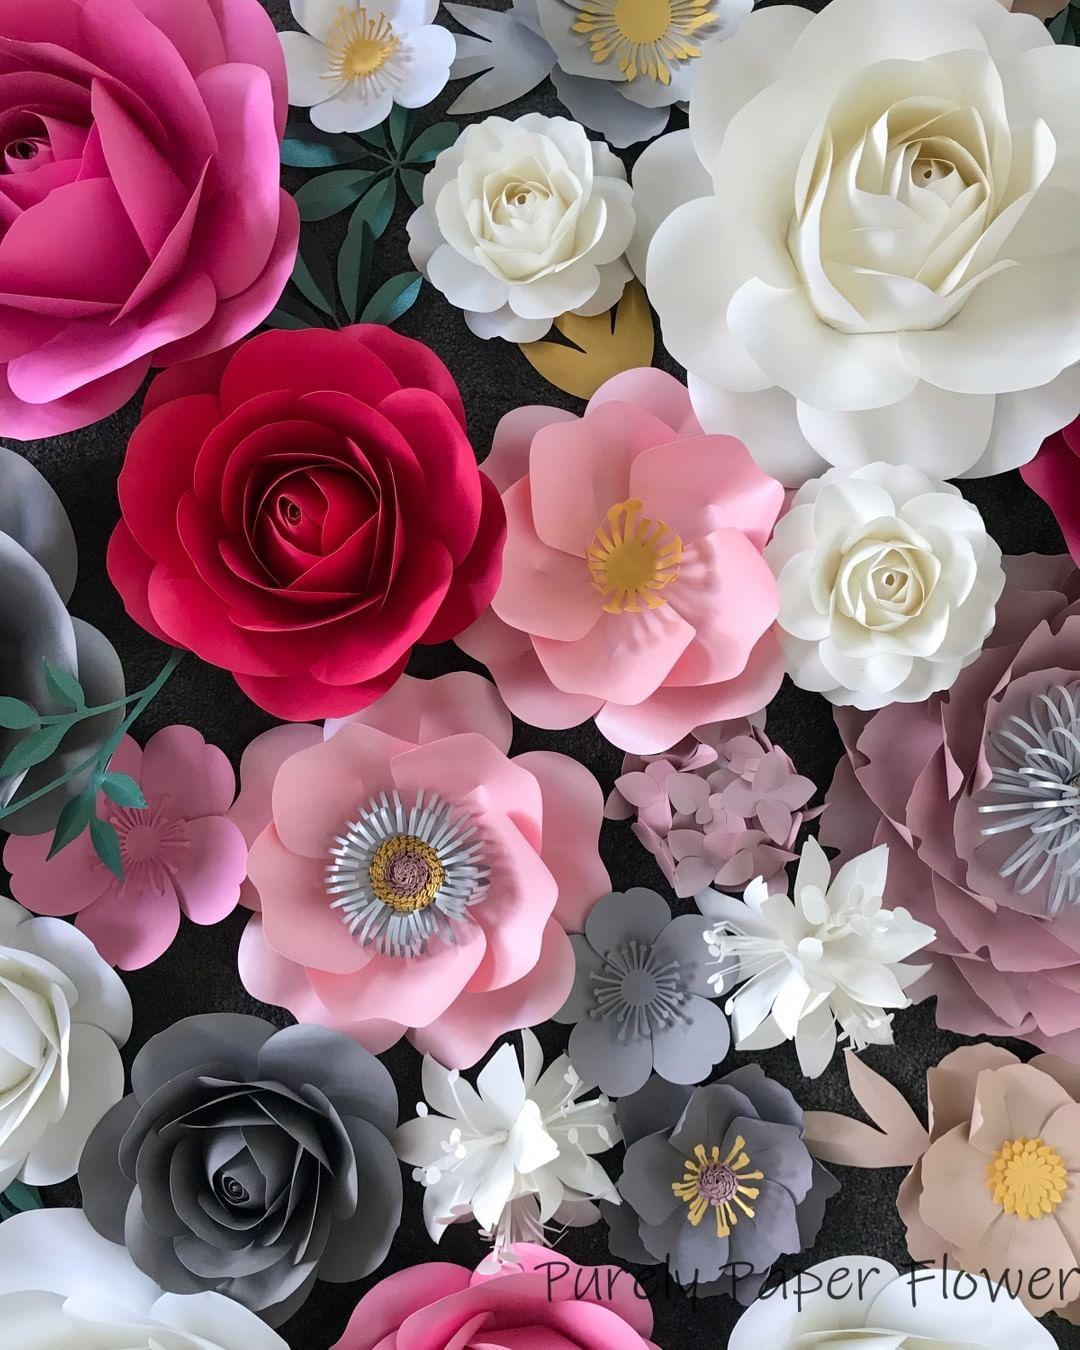 Paper Flowers Melbourne On Instagram